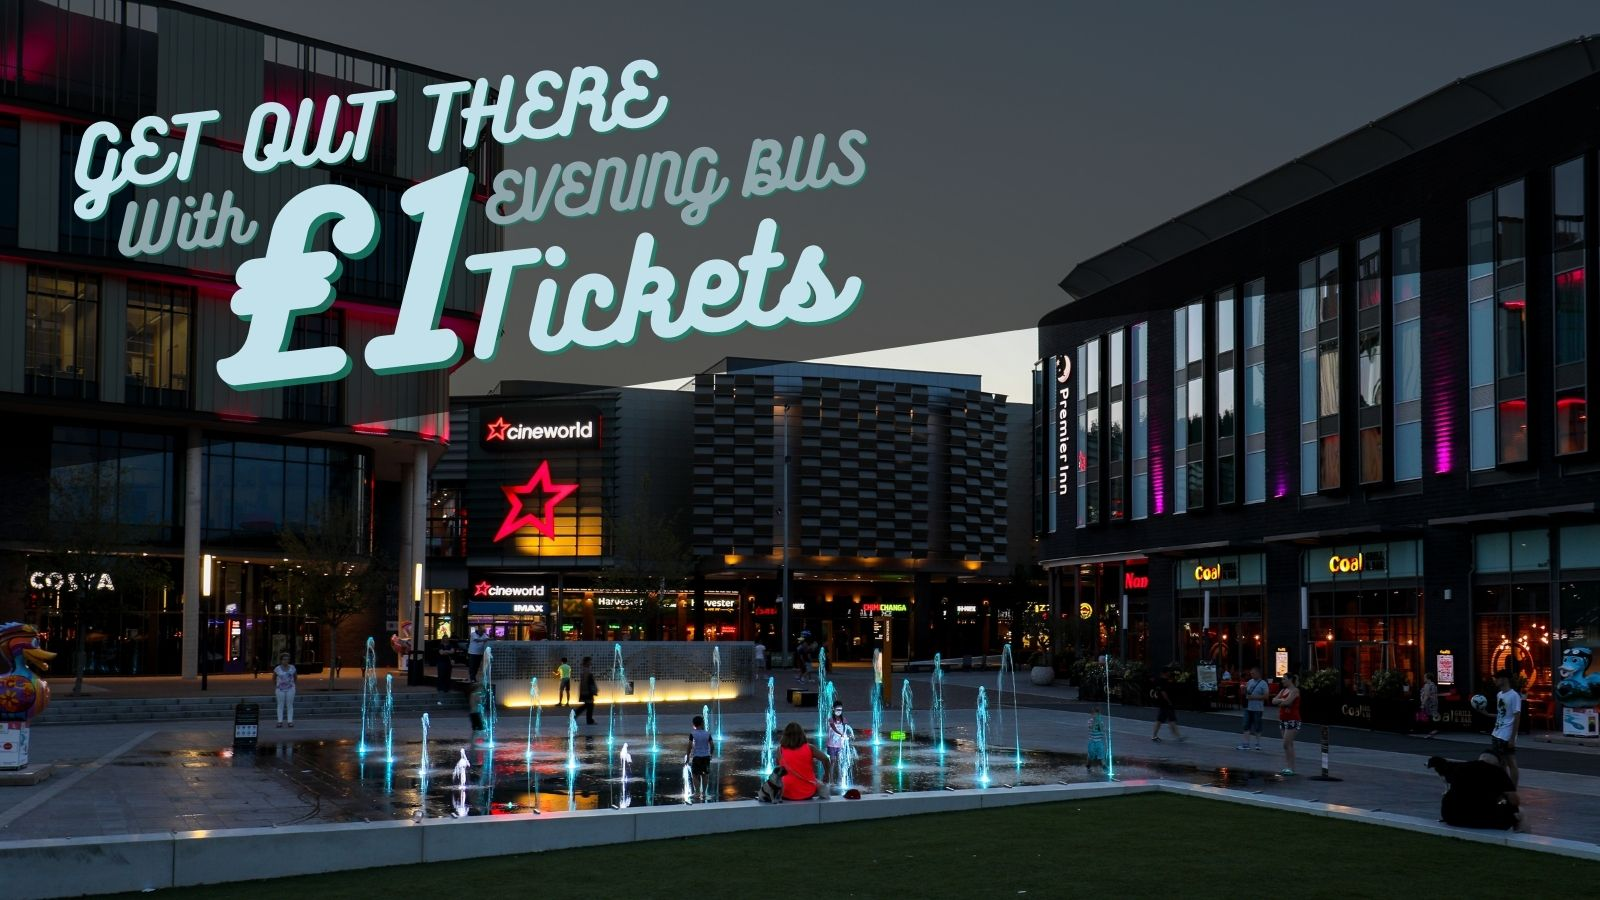 Arriva launch £1 evening bus ticket